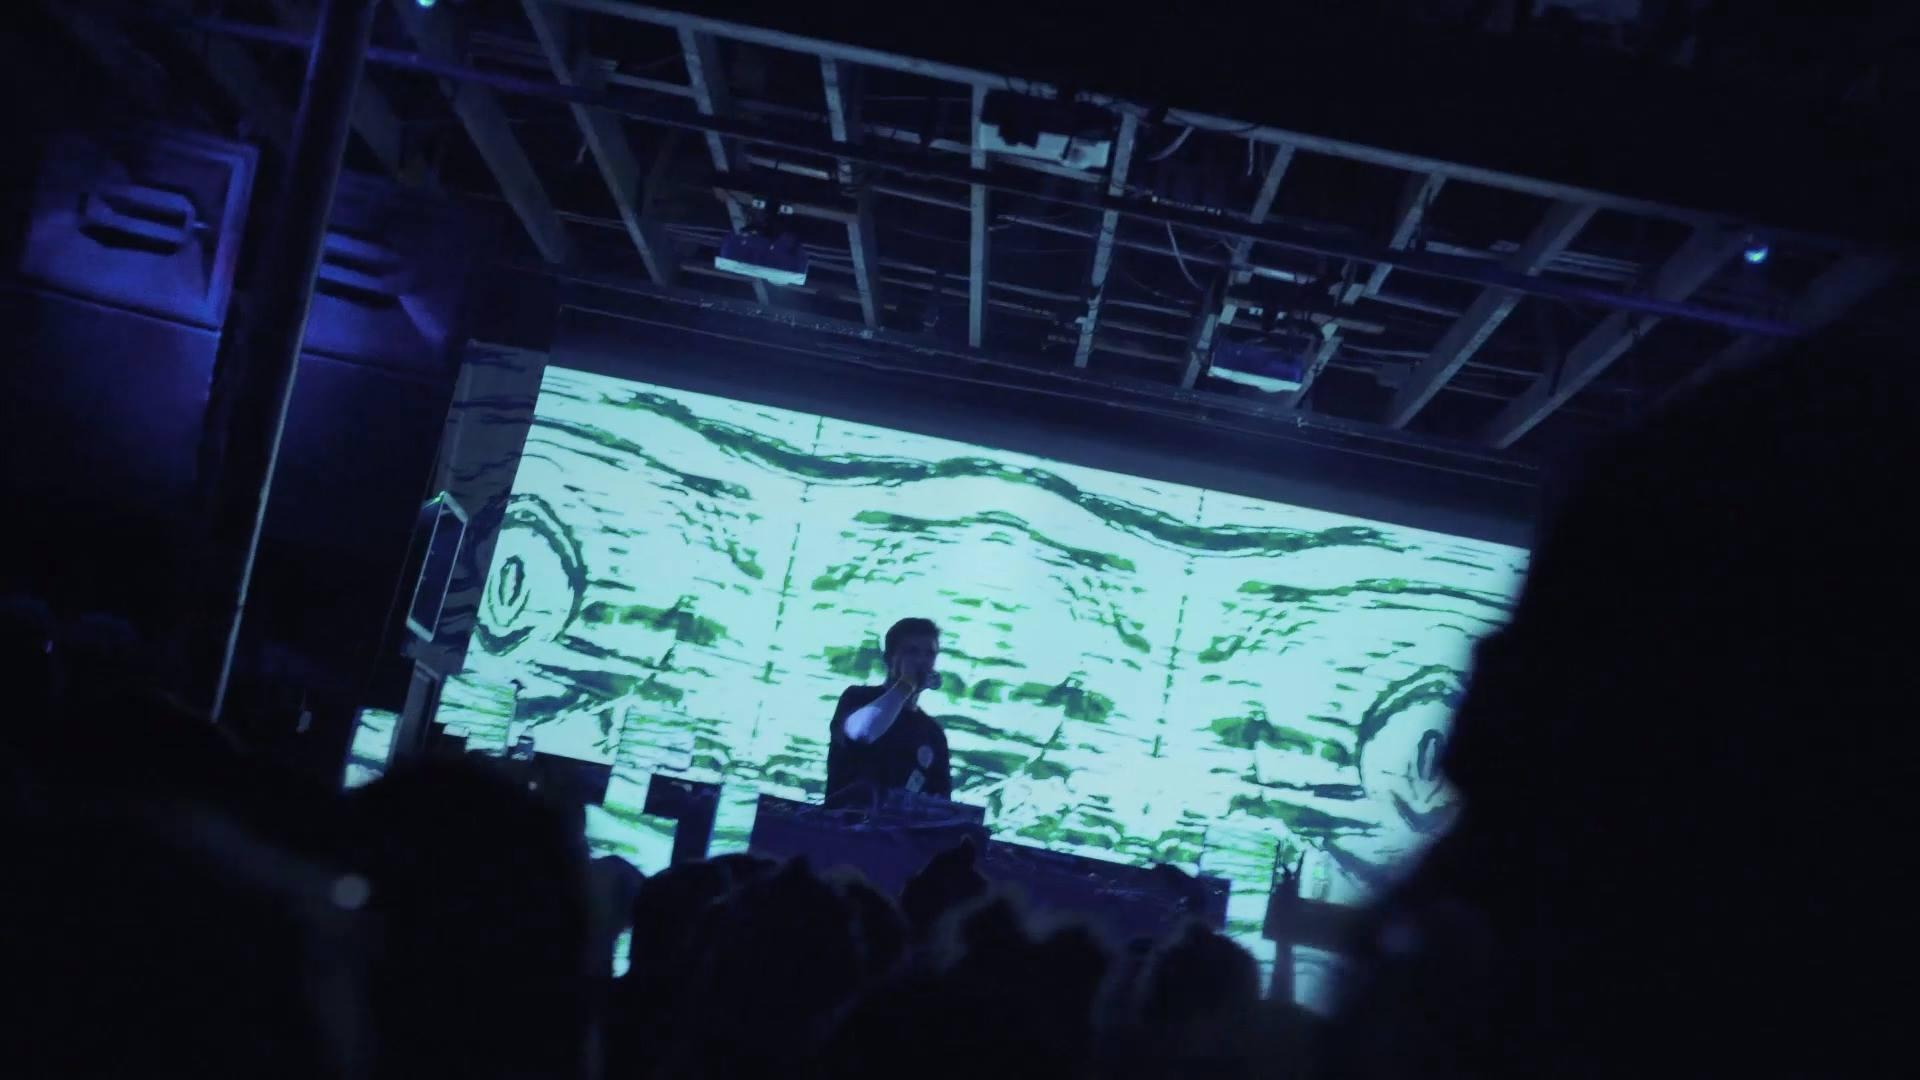 The Black Box 2 Year - Recap Video